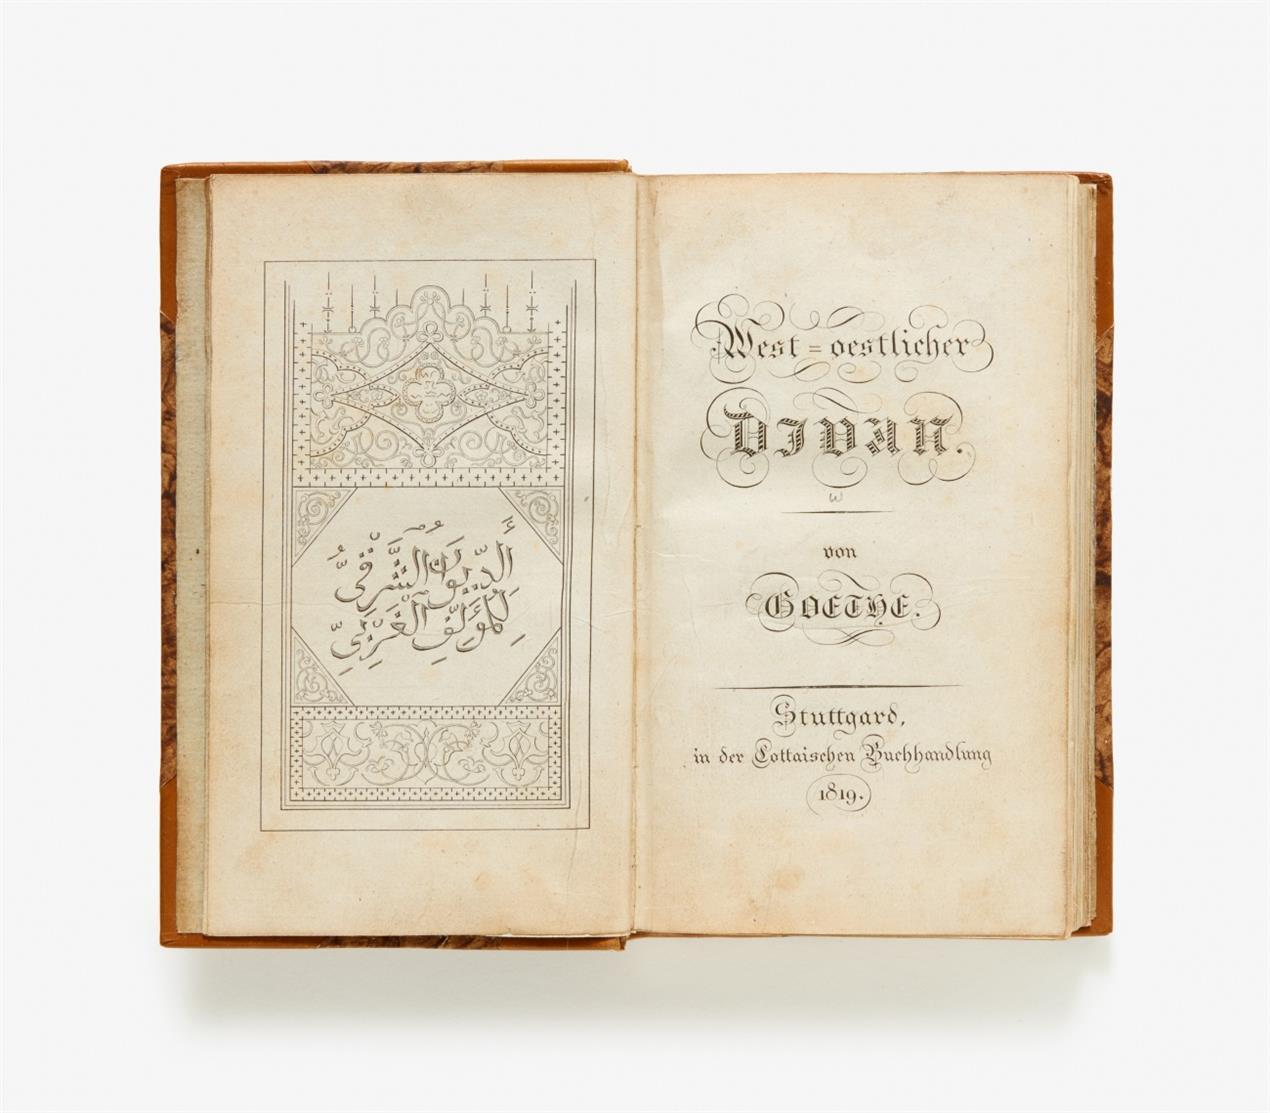 J. W. v. Goethe, West-oestlicher Diwan. Stgt 1819.